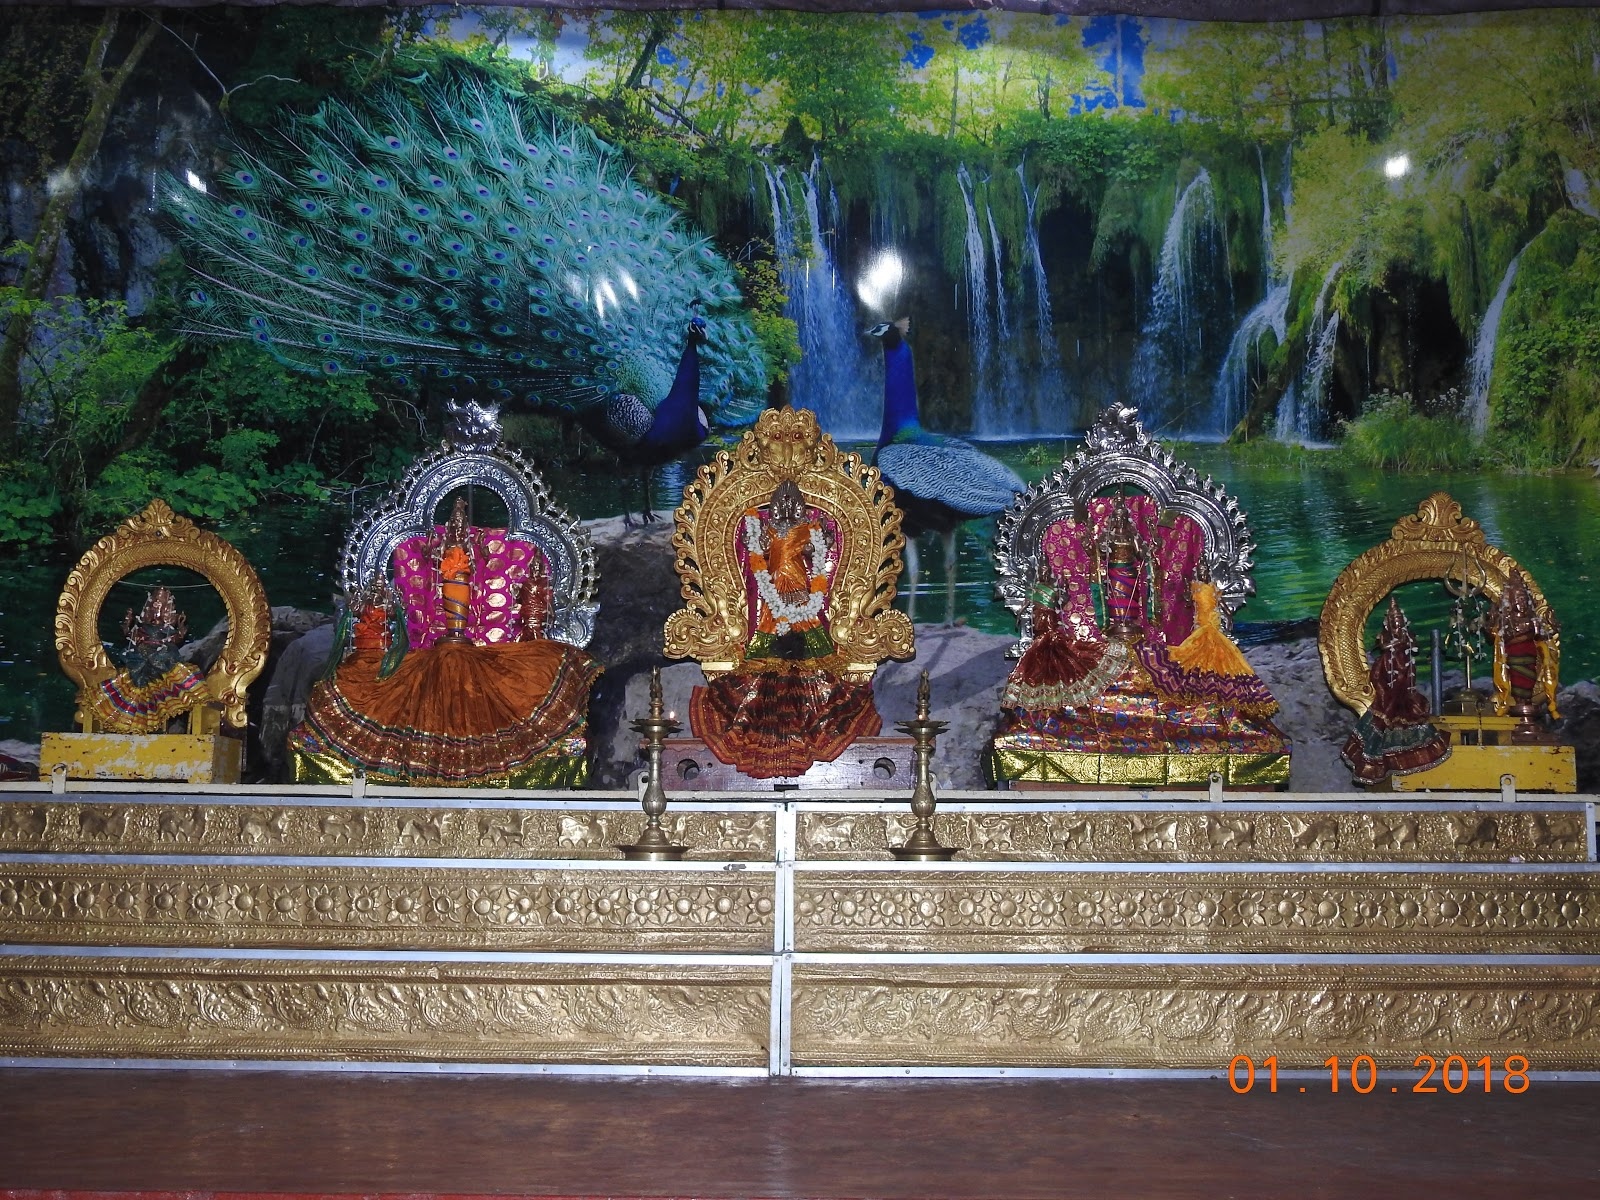 invite-to-paradise-sri-lanka-maldives-holiday-specialists-nutan-vidyut-patel-temple-1.jpg